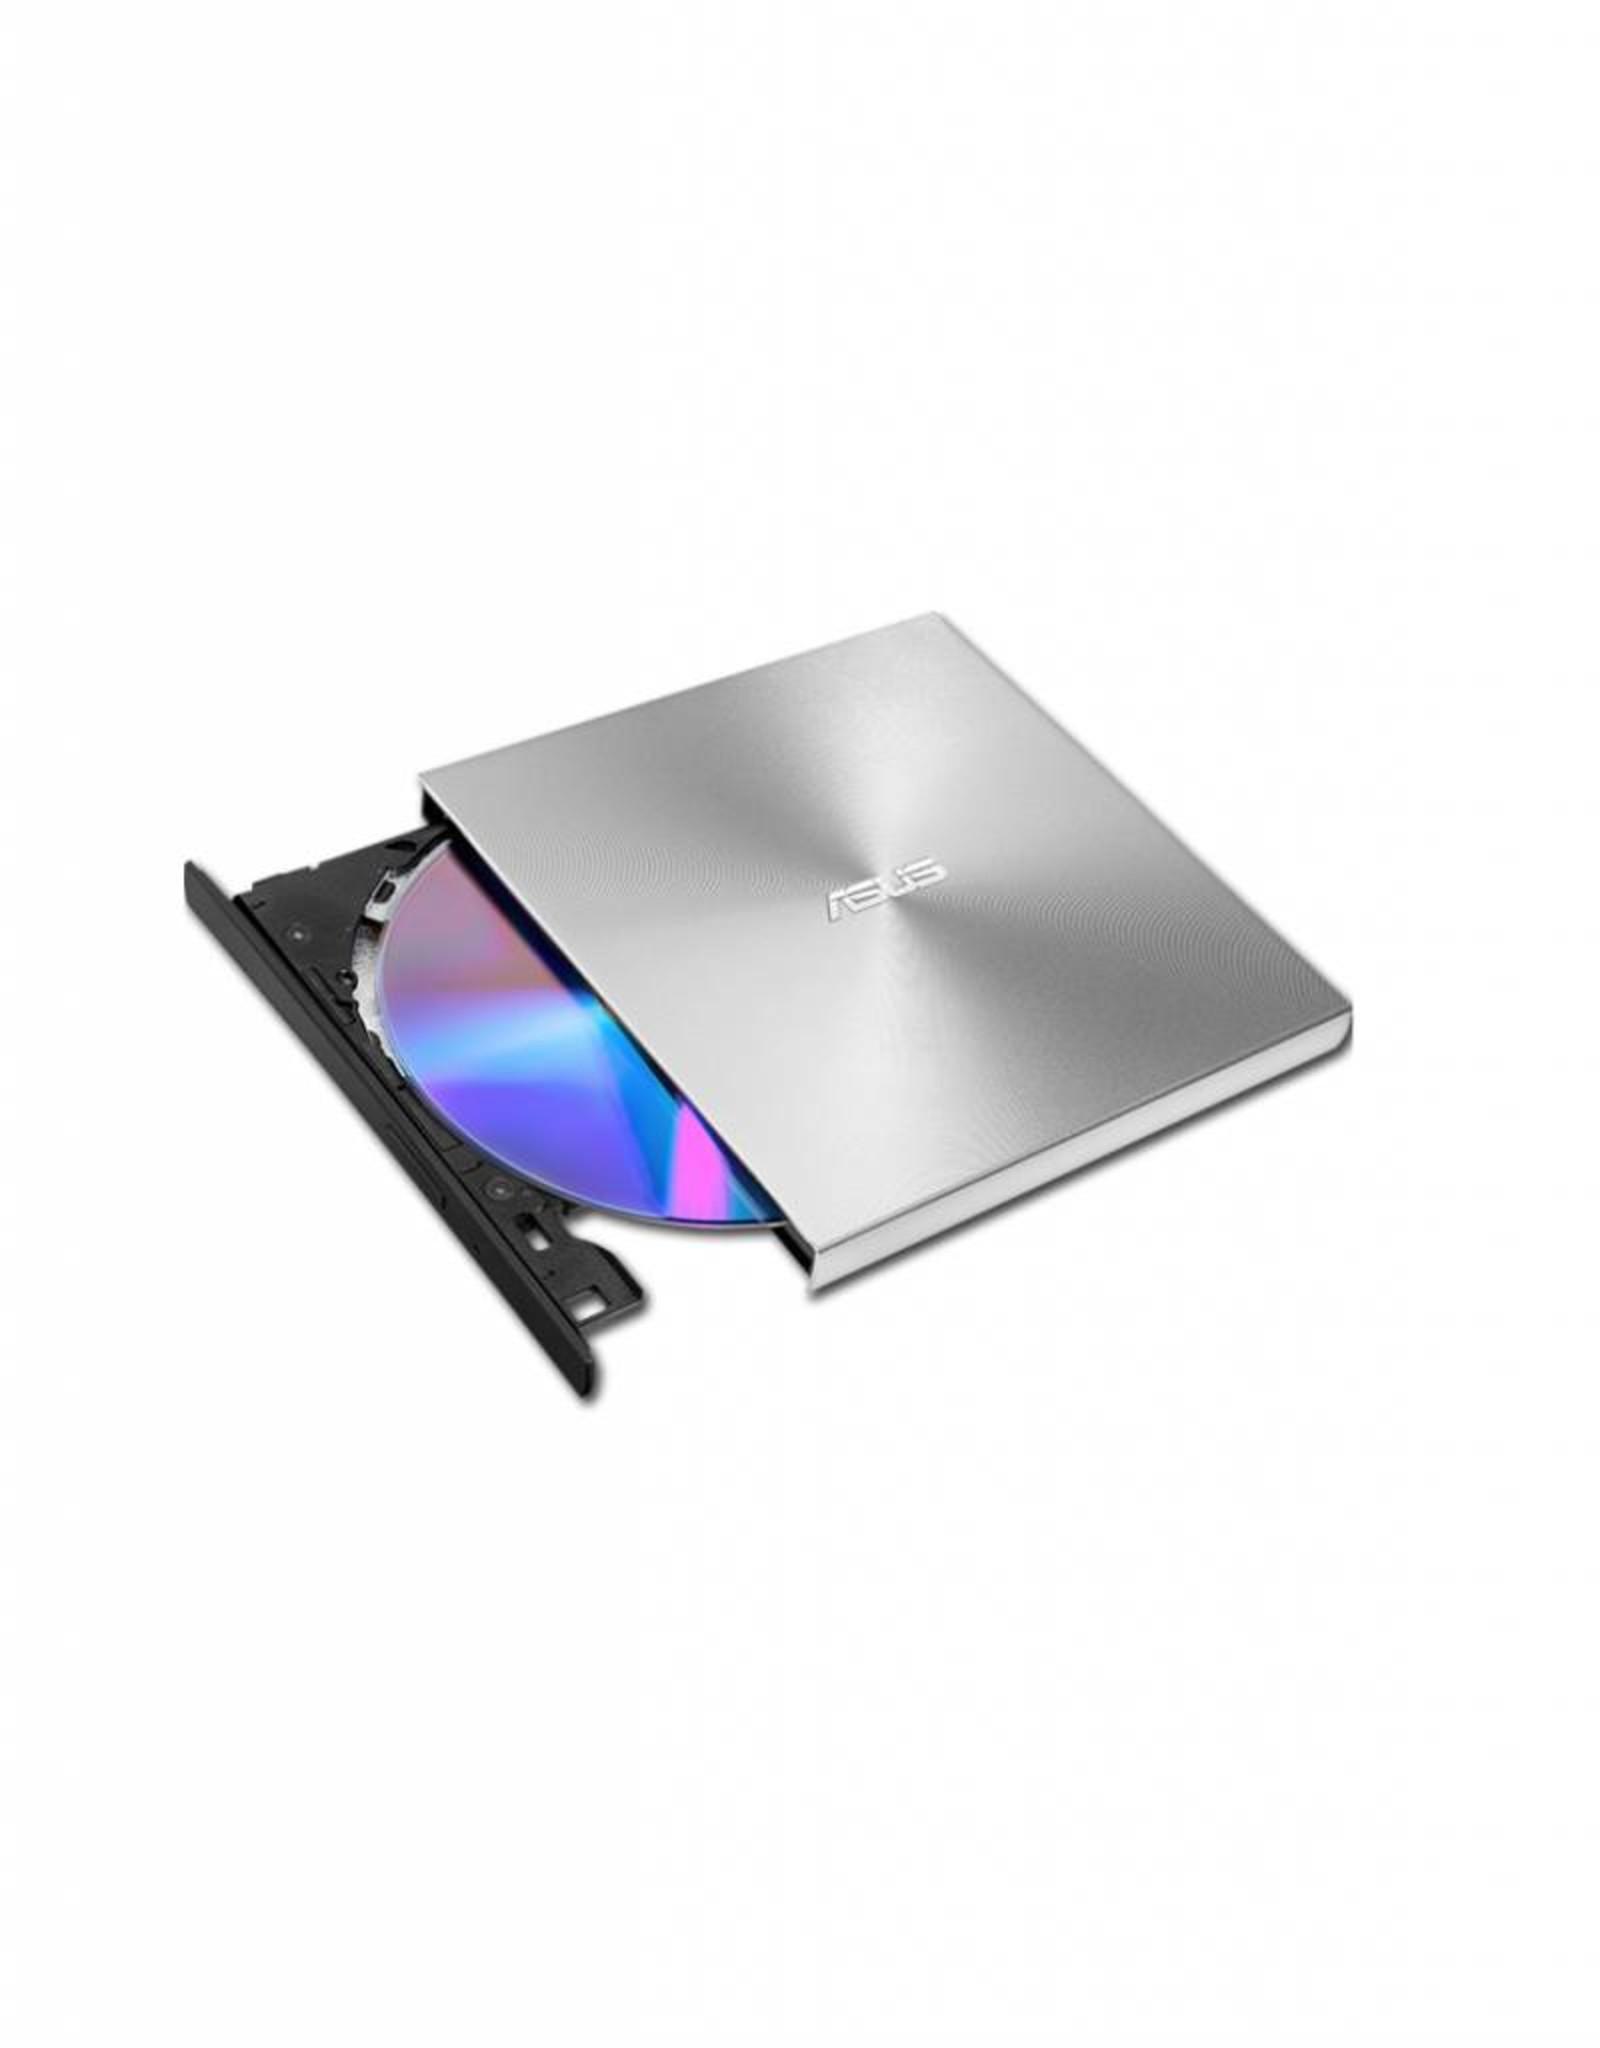 ASUS ASUS USB-C/USB ZENDRIVE DVD WRITER